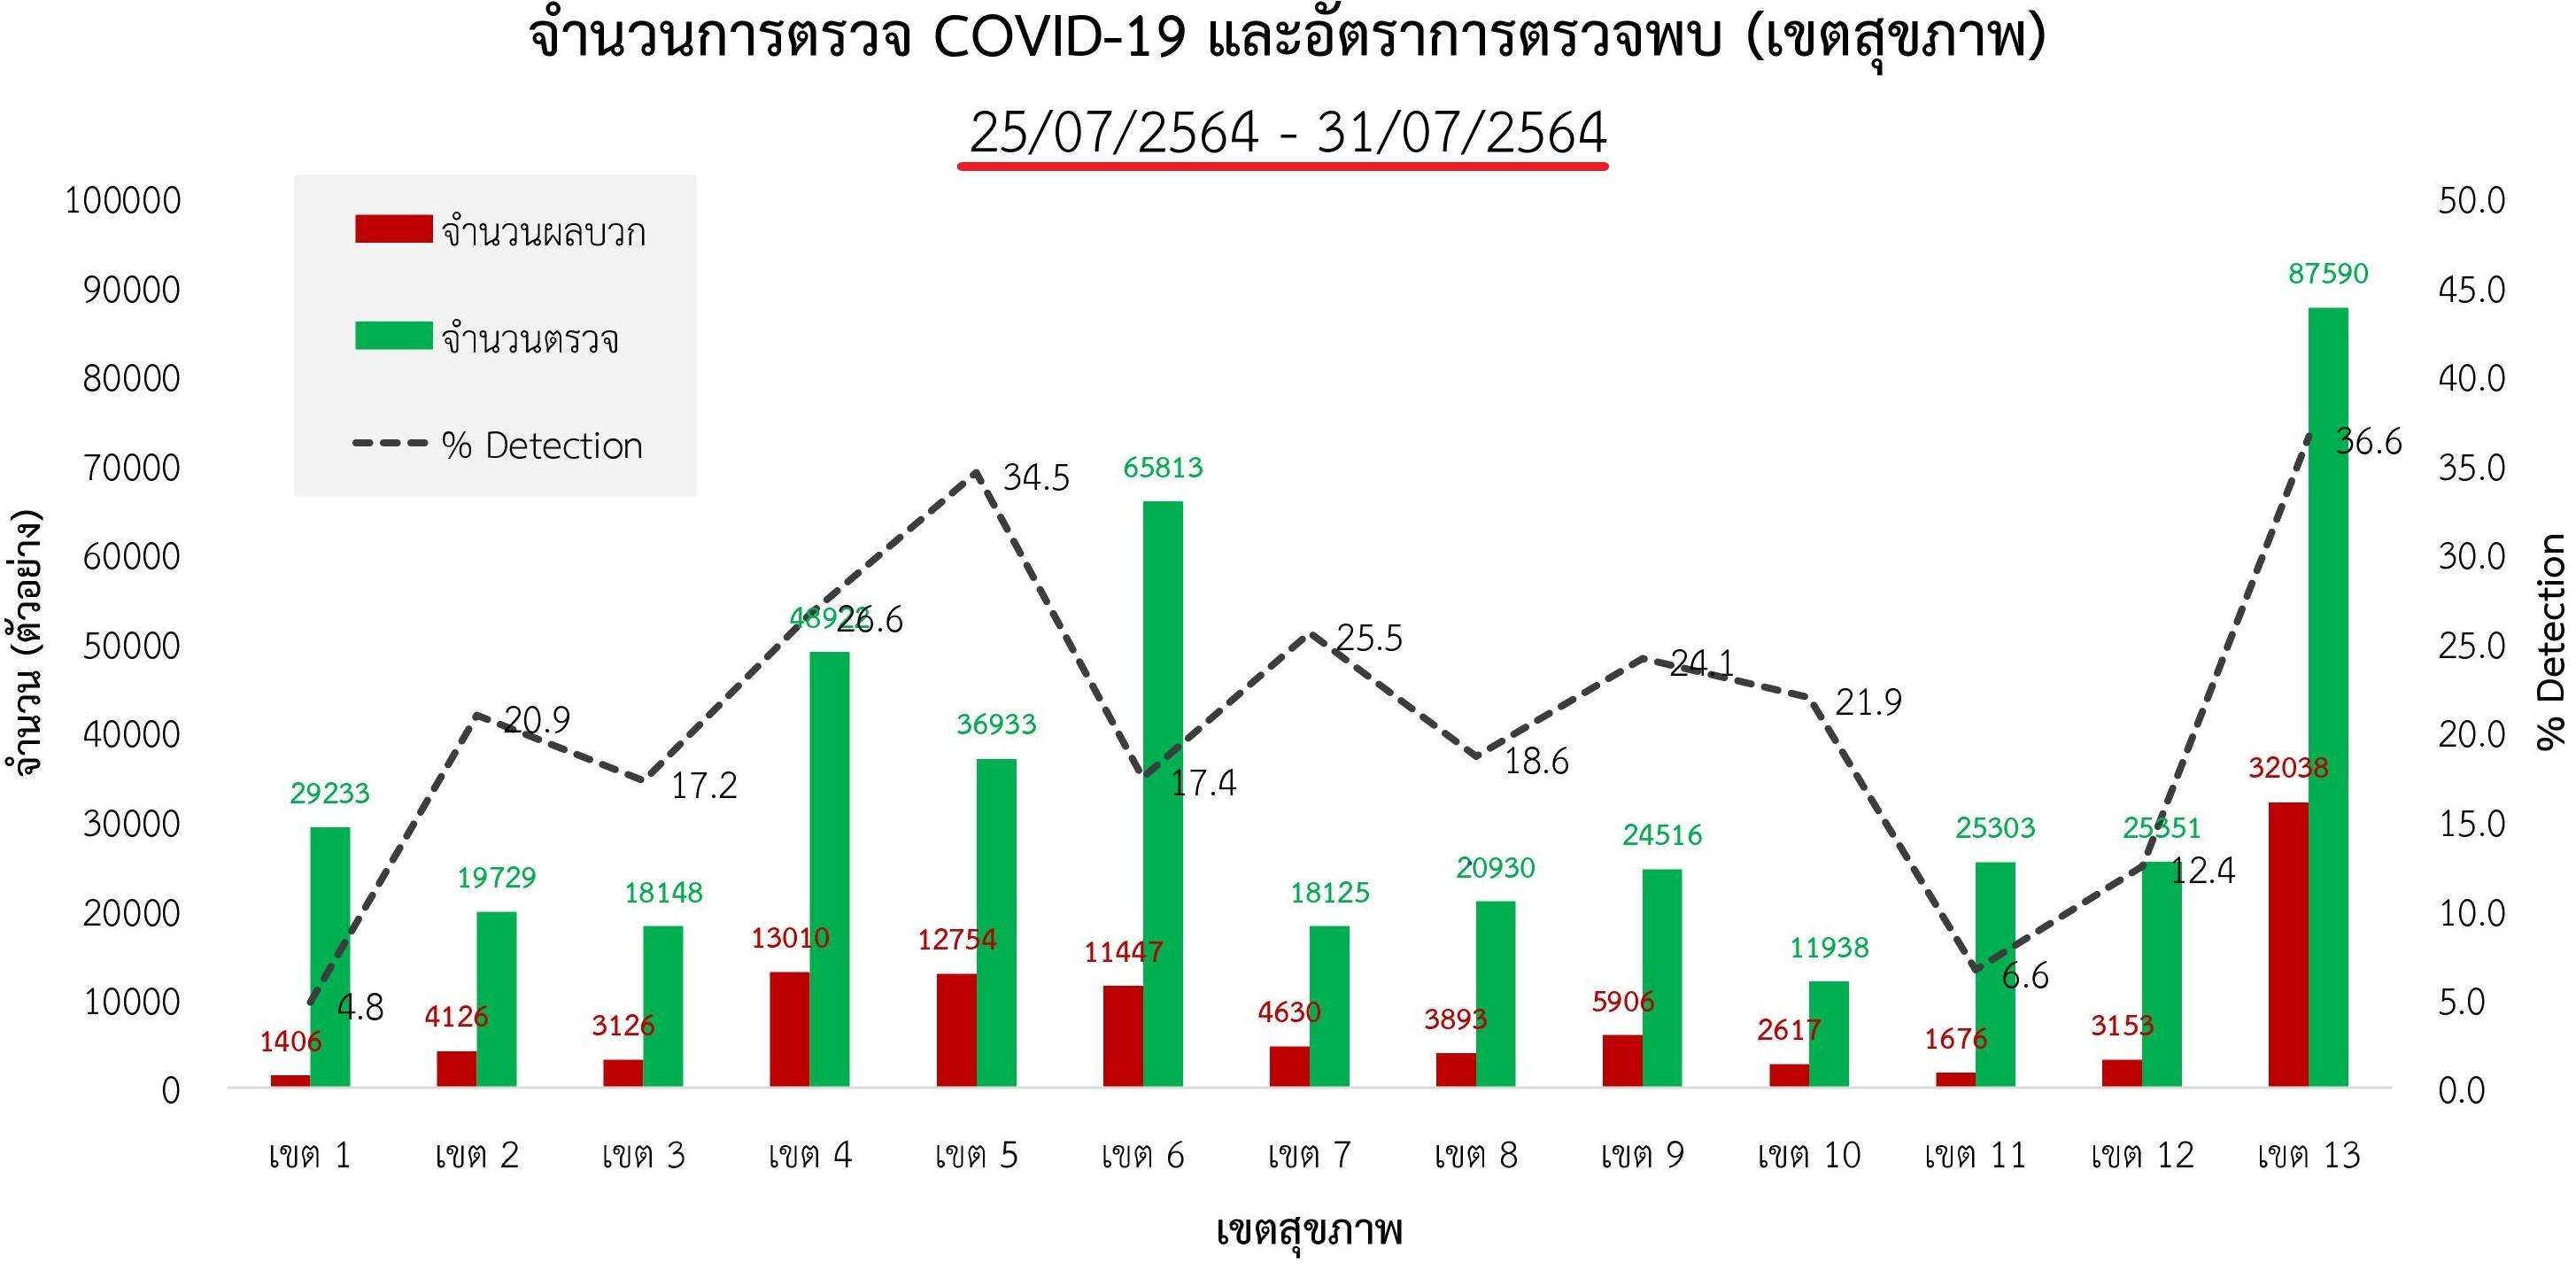 www.thaiguide.dk/images/forum/covid19/procent%20positive%20test%20regioner%201%2031-07-21.jpg